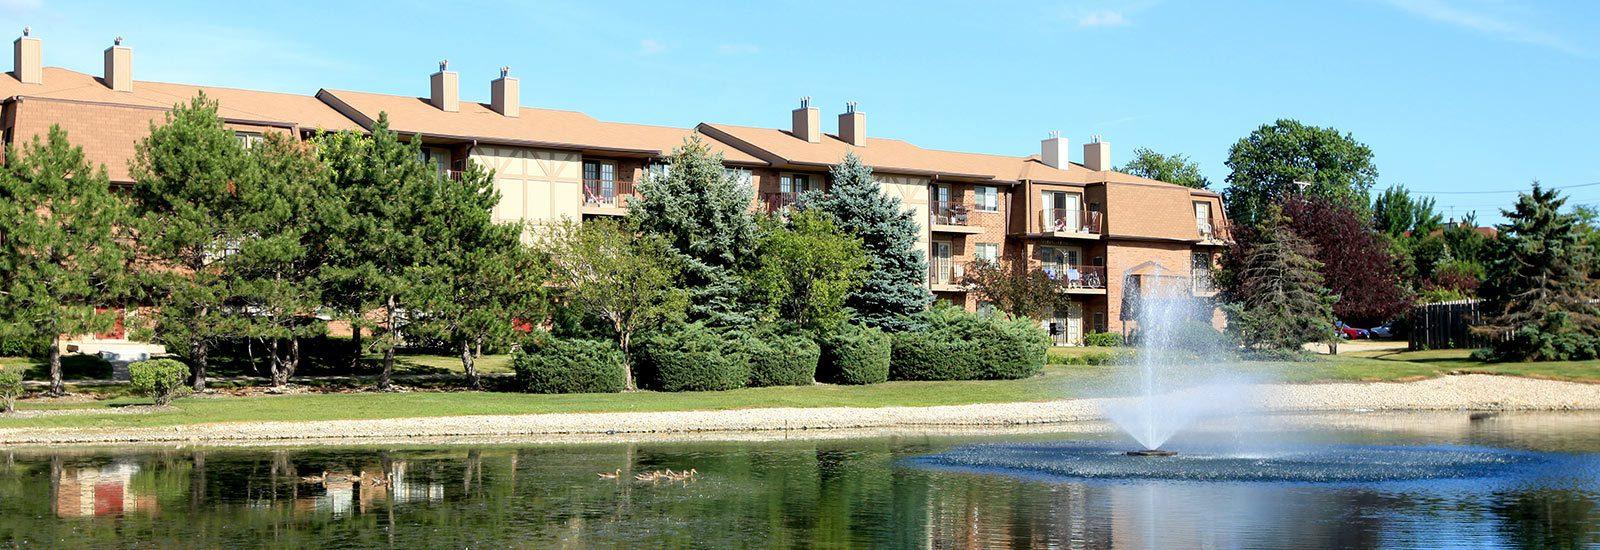 Apartments in Hoffman Estates